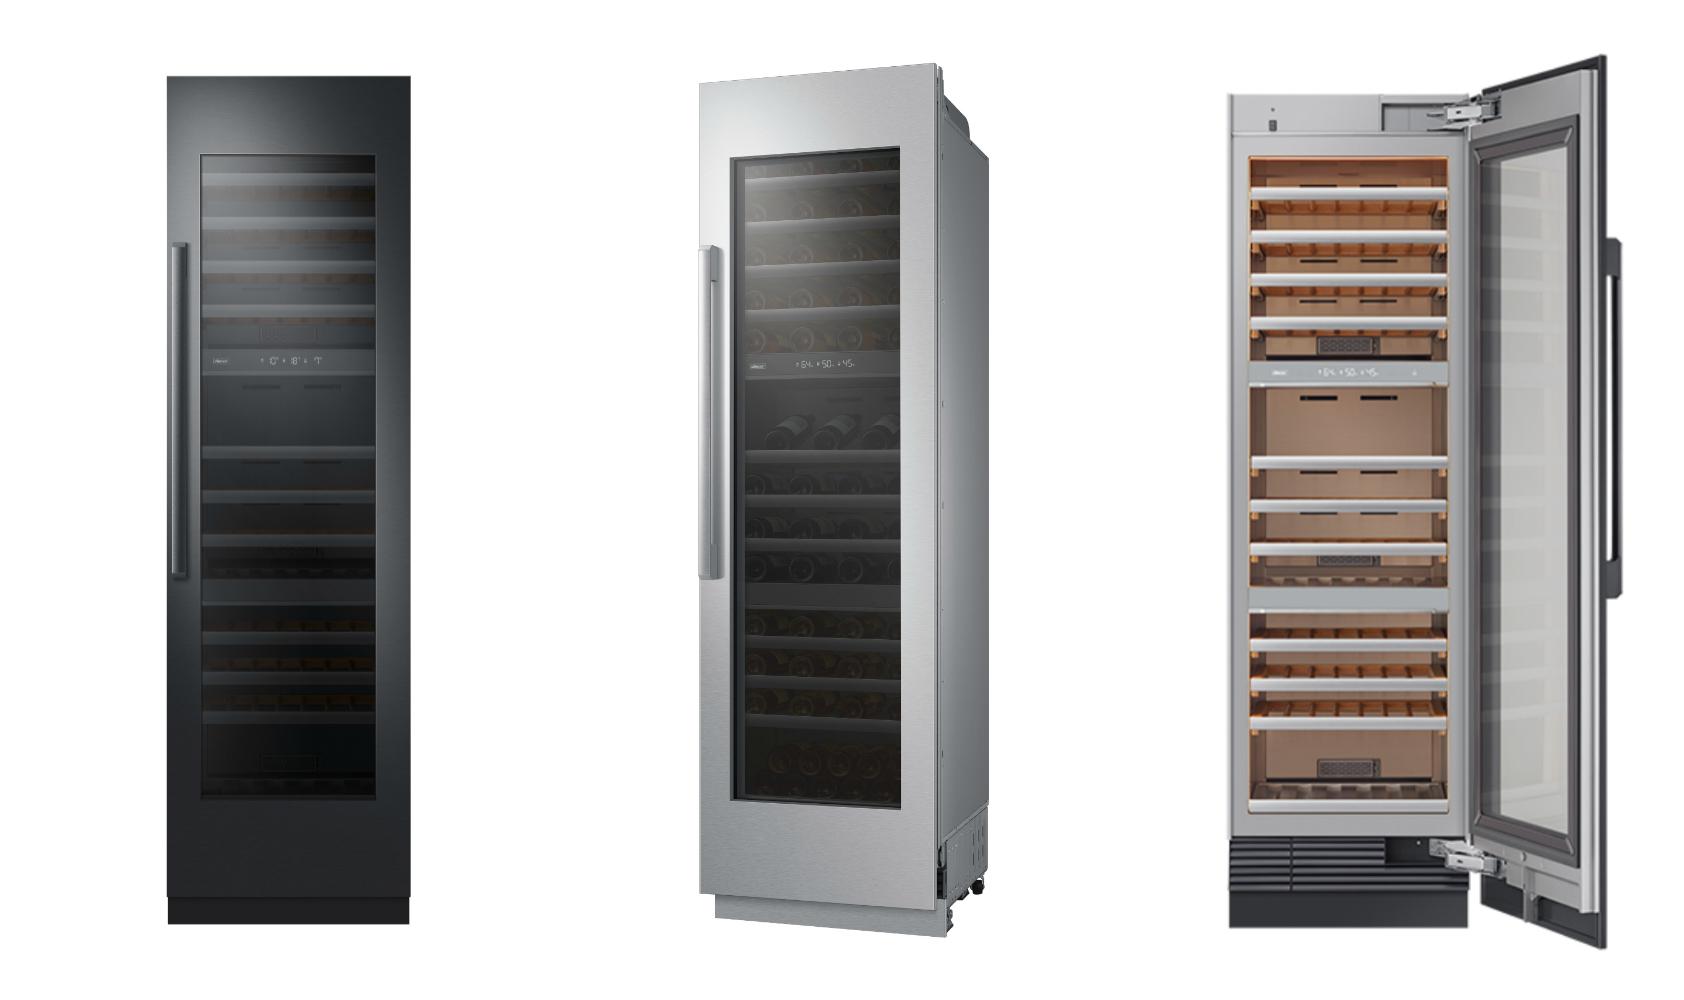 fridge trio dacor.jpg